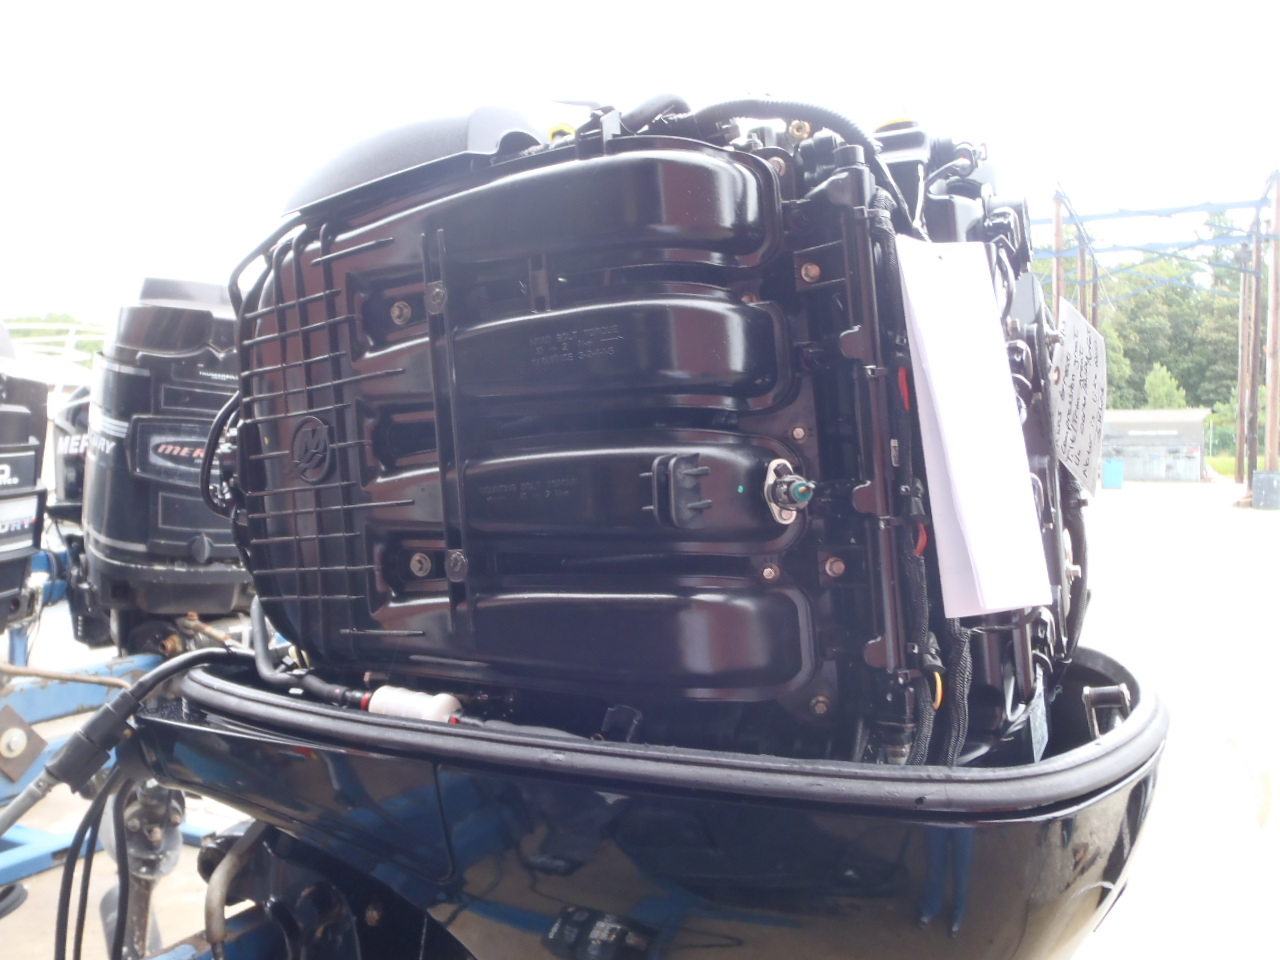 Used 2011 Mercury 115elpt Efi 115hp 4 Stroke Outboard Boat